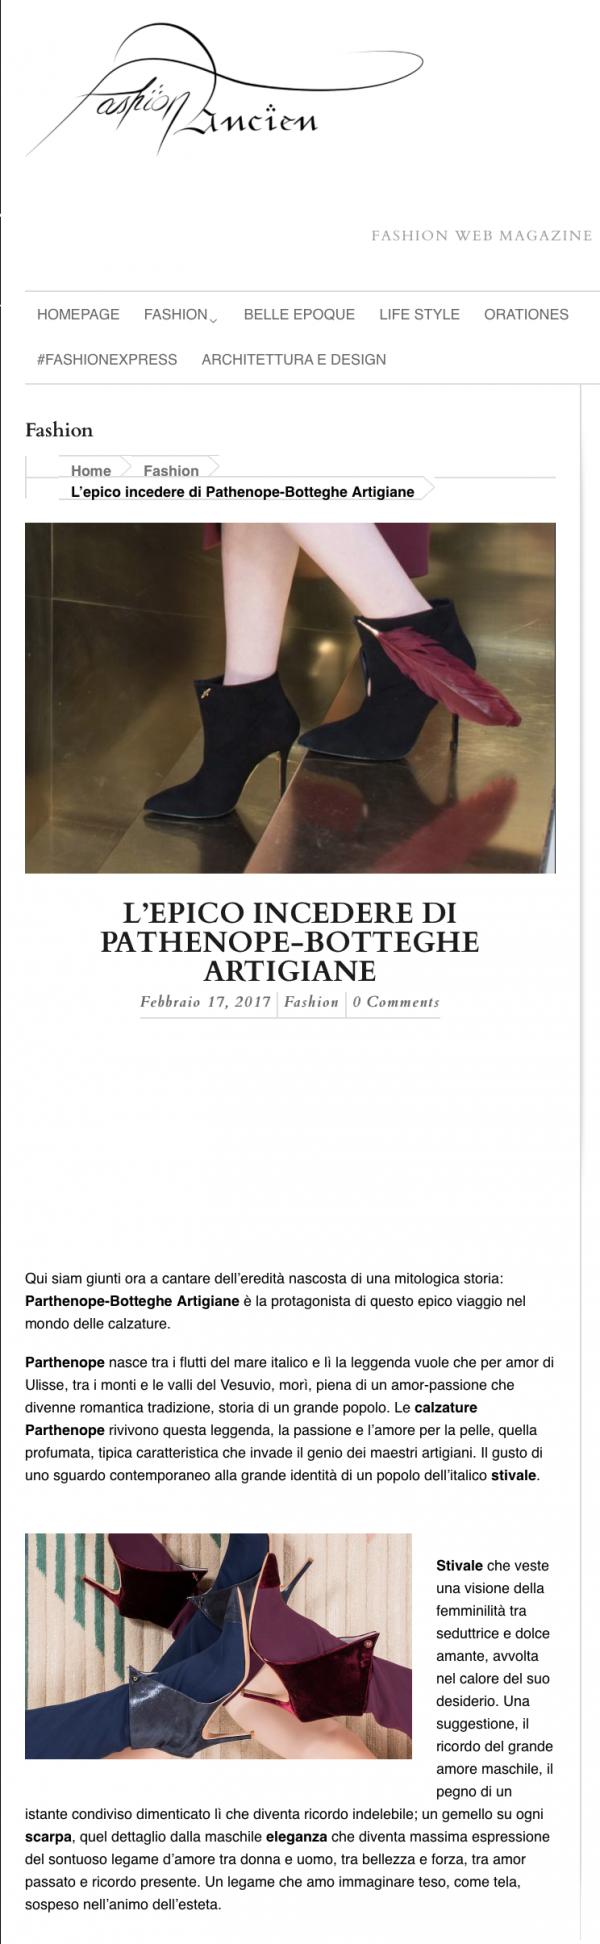 http://www.fashionancien.com/2017/02/17/lepico-incedere-di-pathenope-botteghe-artigiane/